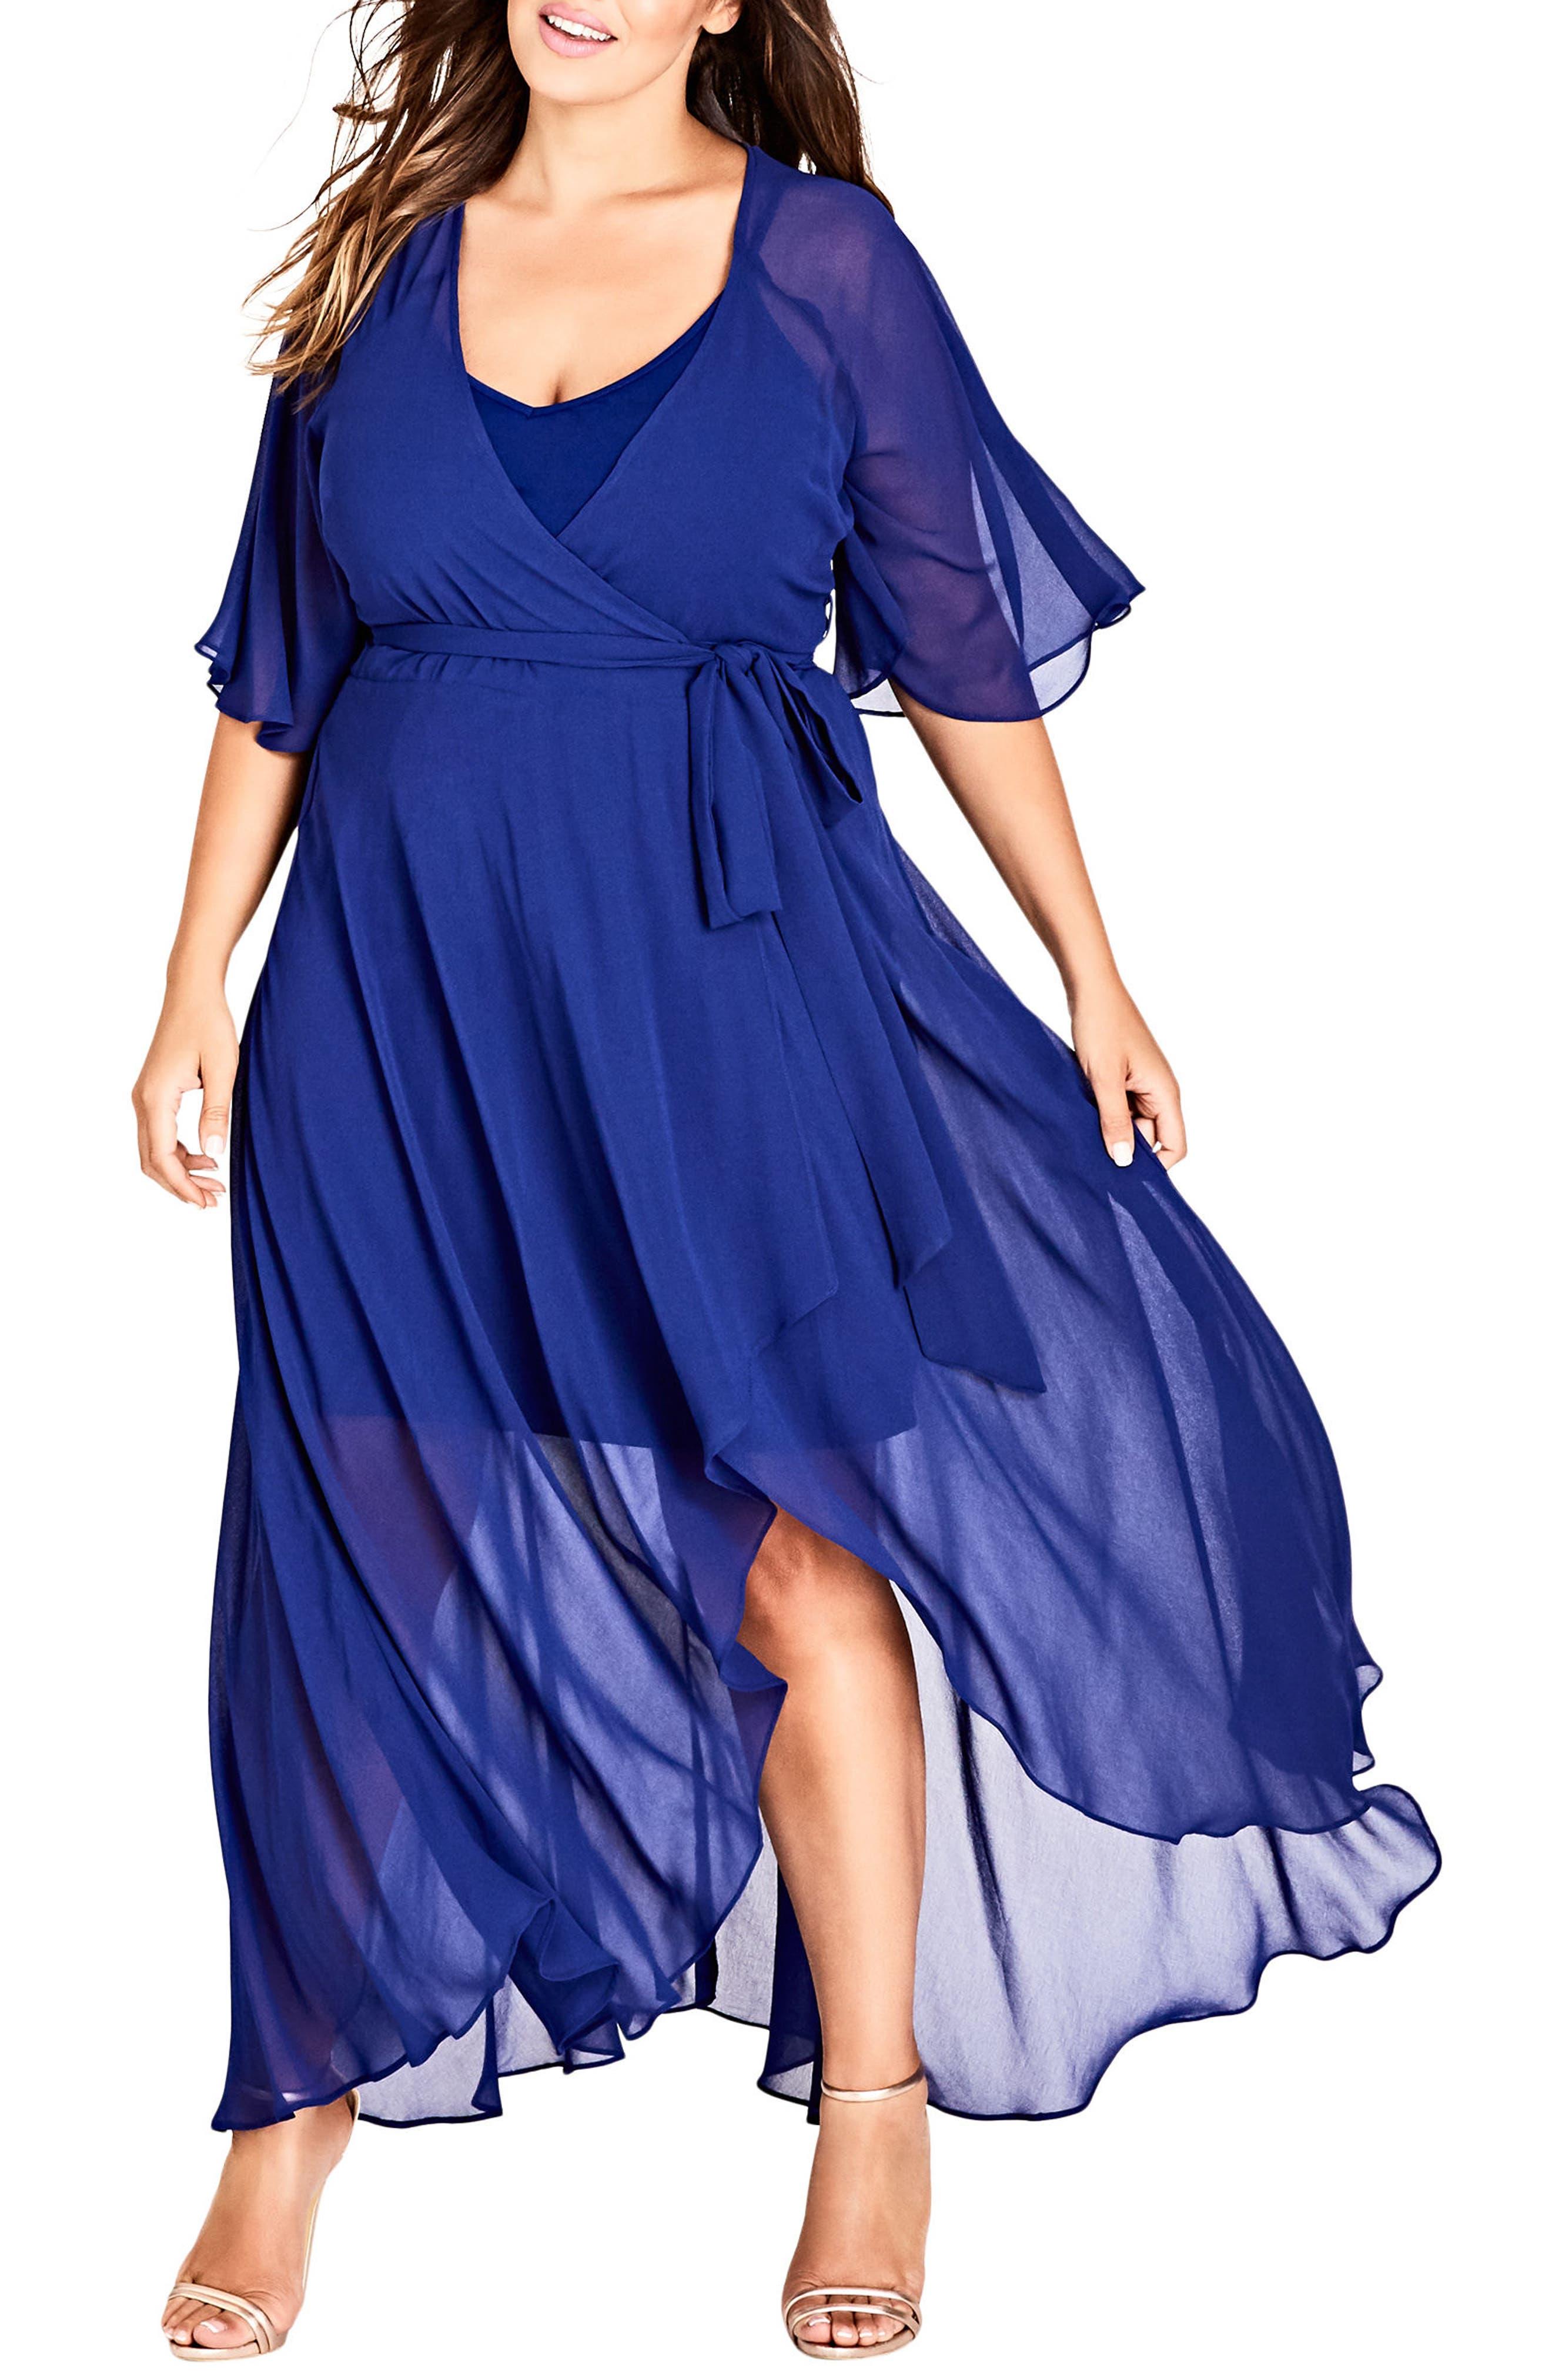 Enthrall Me High/Low Dress,                         Main,                         color, Lapis